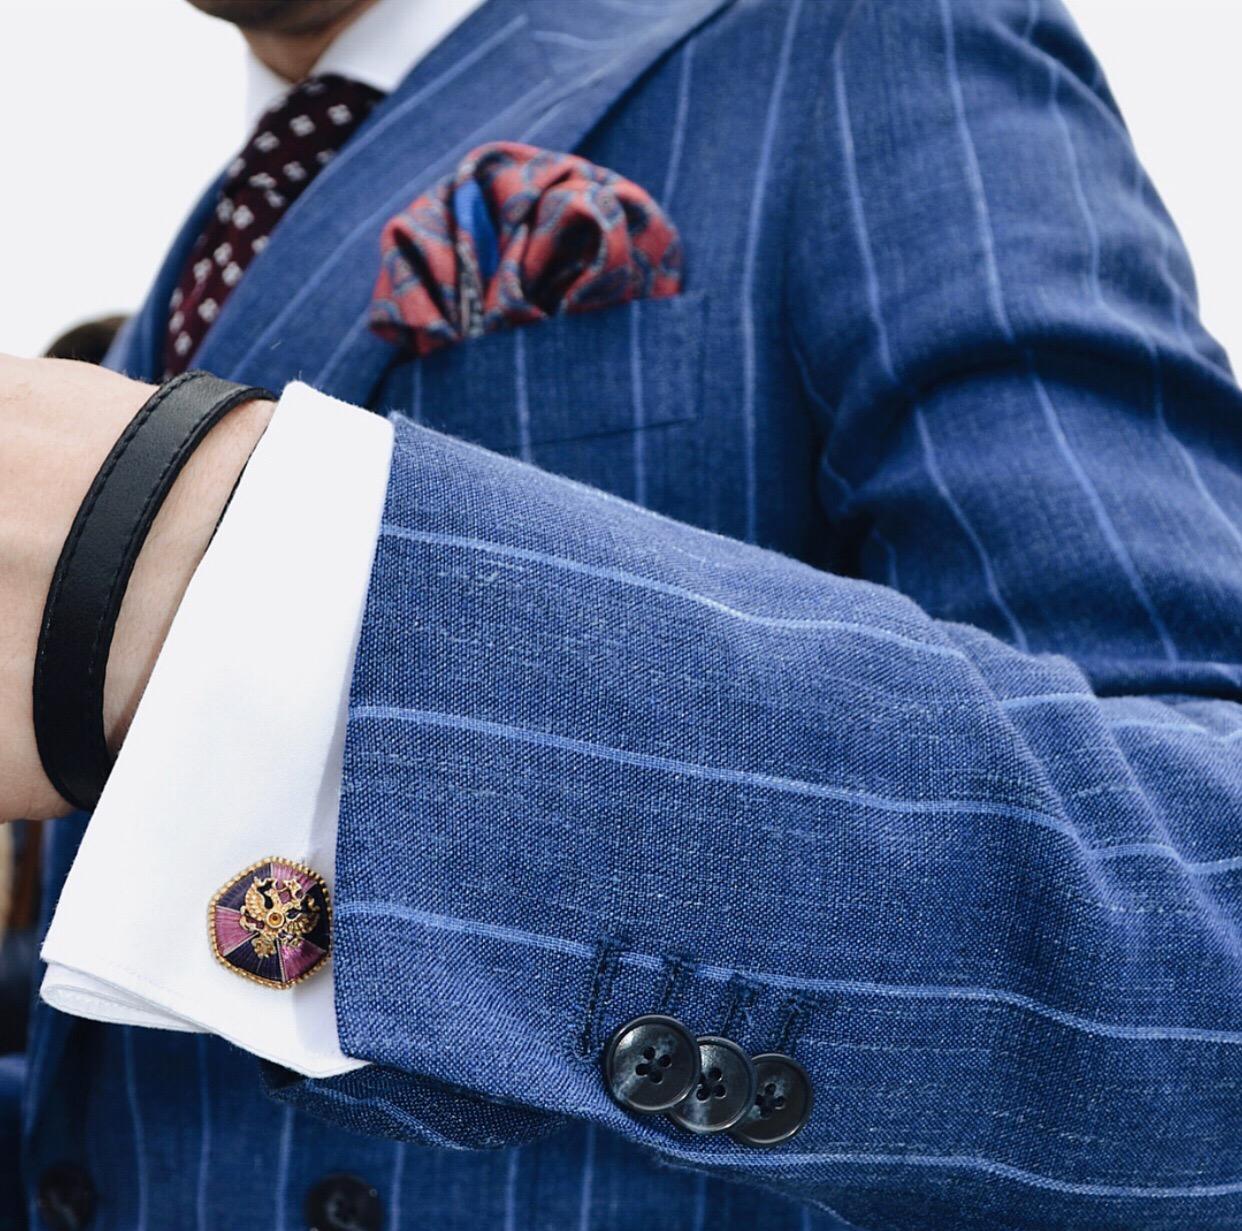 Образ от #Gustavo на осень - темно-синий двубортный костюм в светлую полоску из фланели Vitale Barberis Canonico